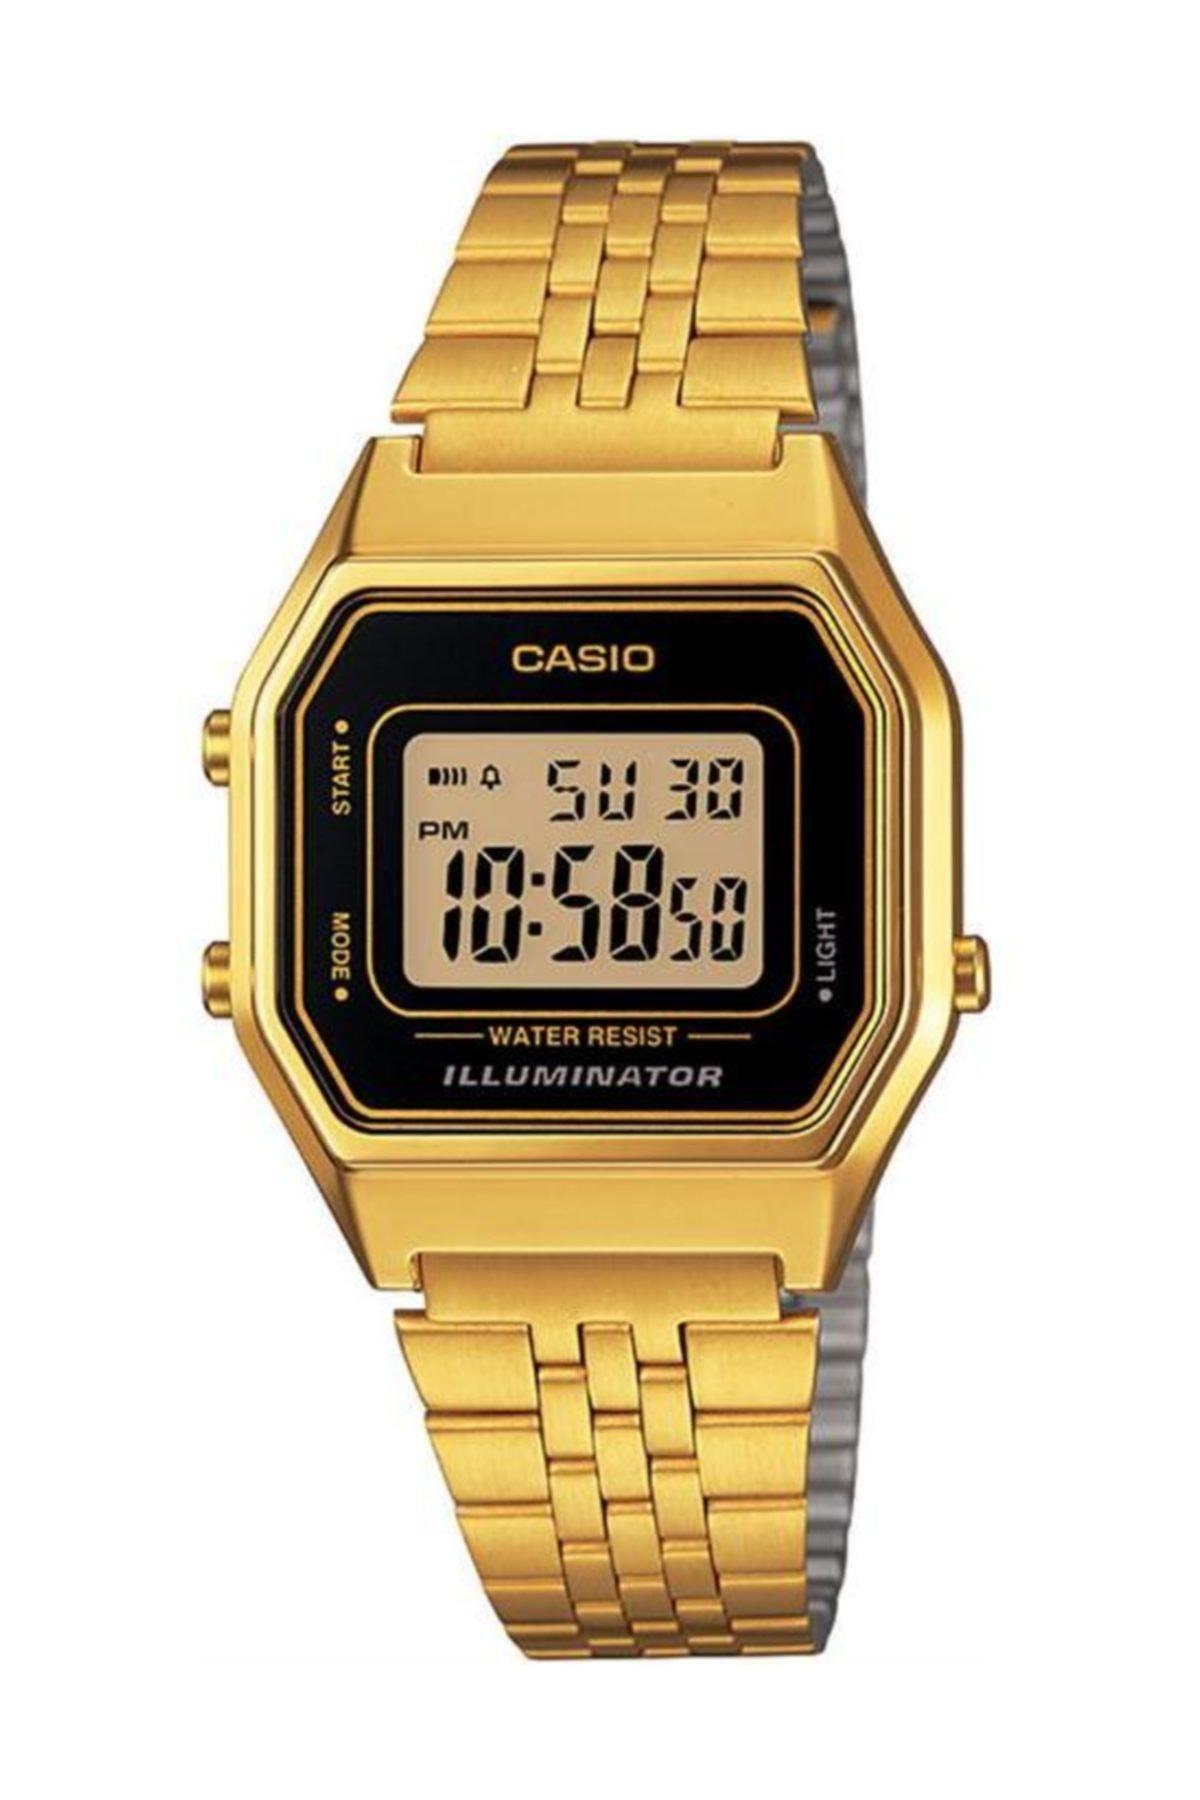 Casio La680wga-1df Kadın Kol Saati 1